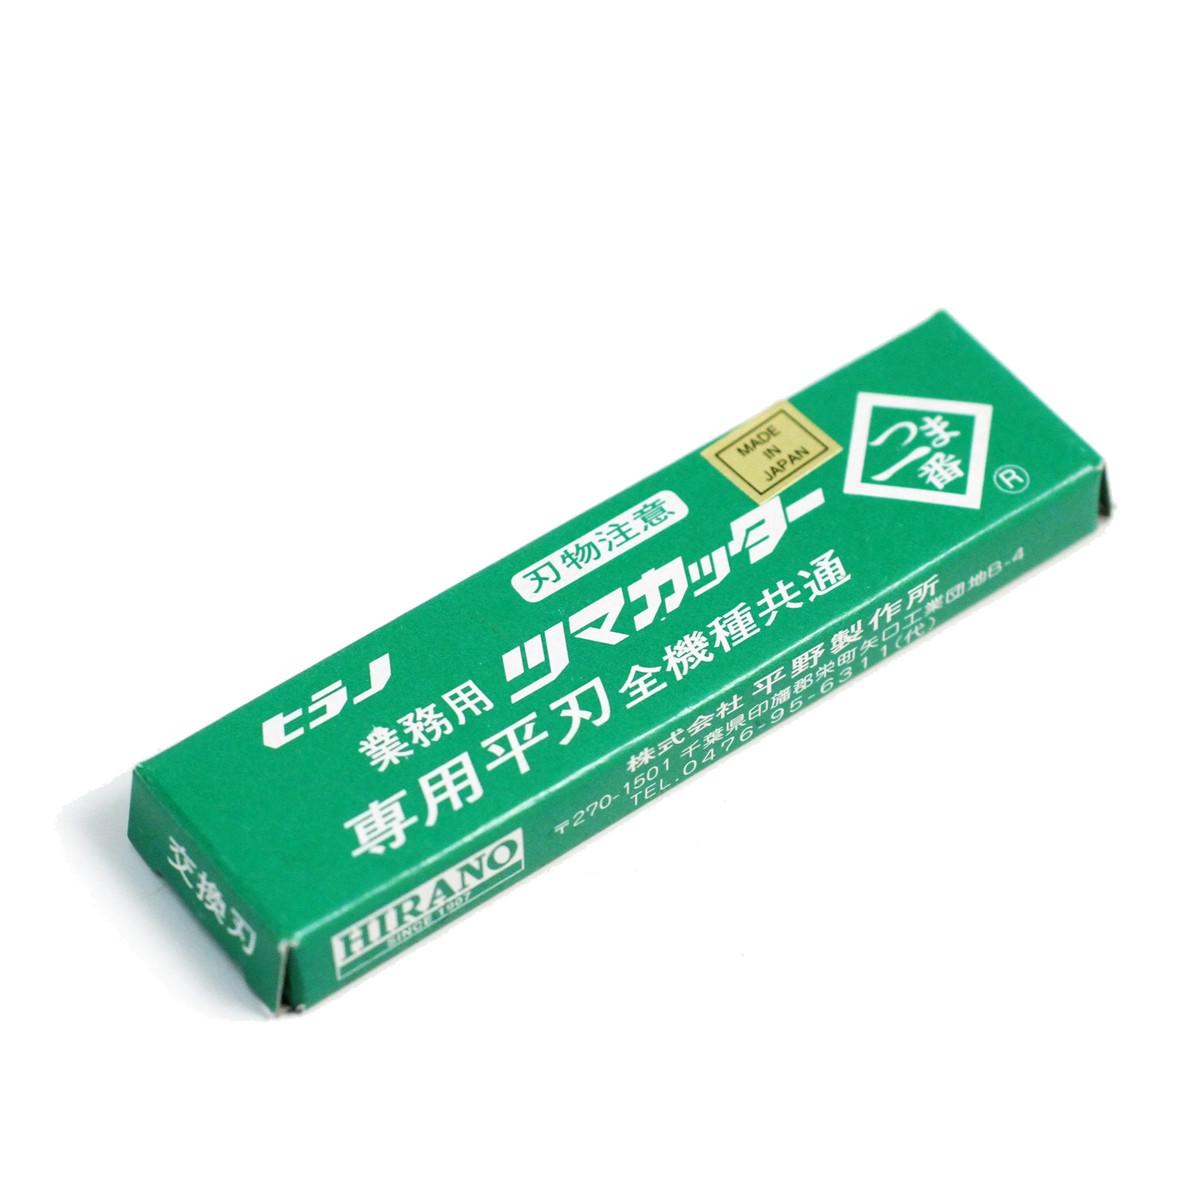 Replacement Standard Blade for Tsuma Ichiban